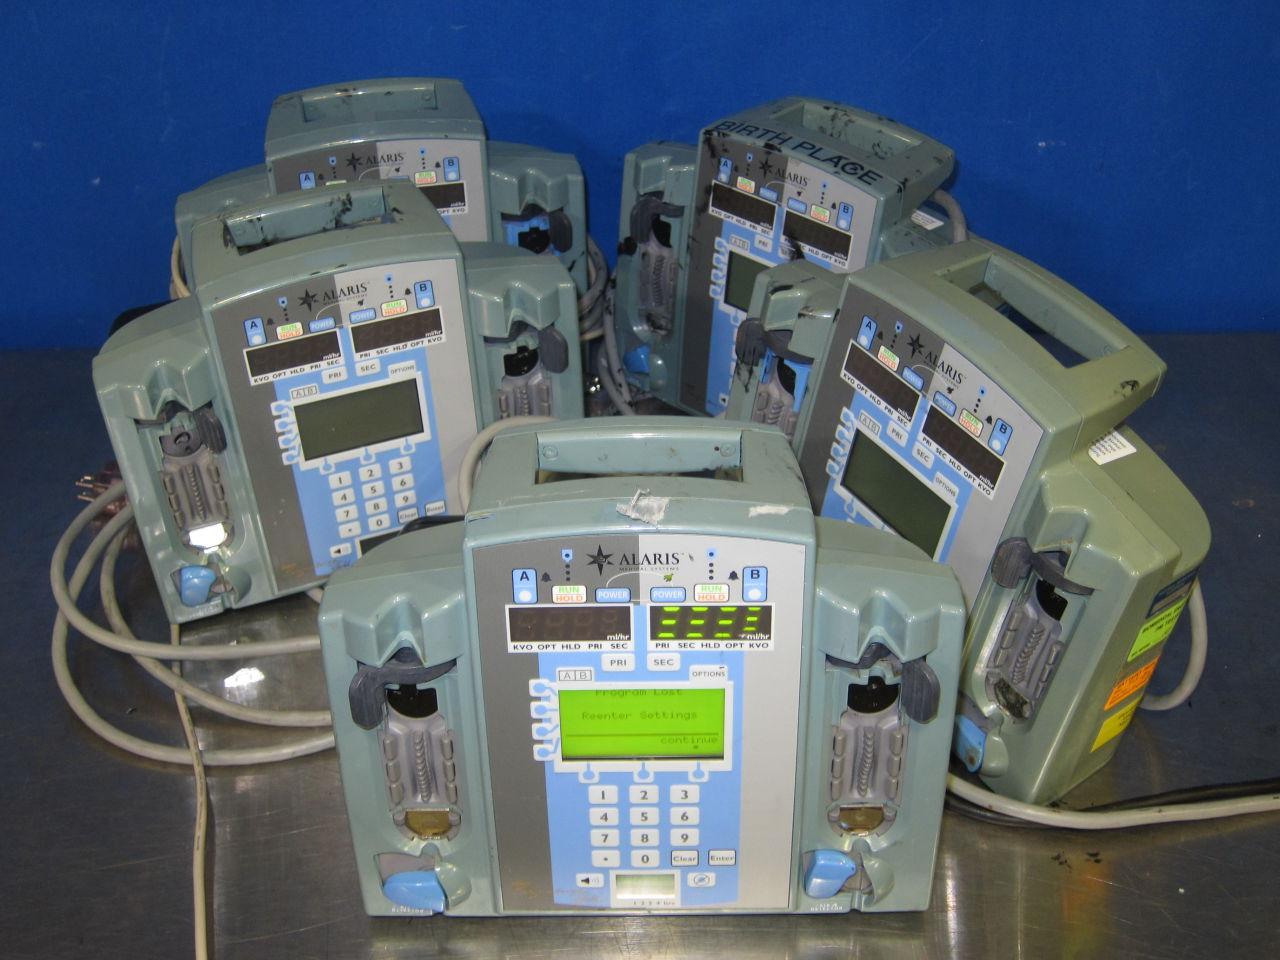 ALARIS 7230  - Lot of 5 Pump IV Infusion